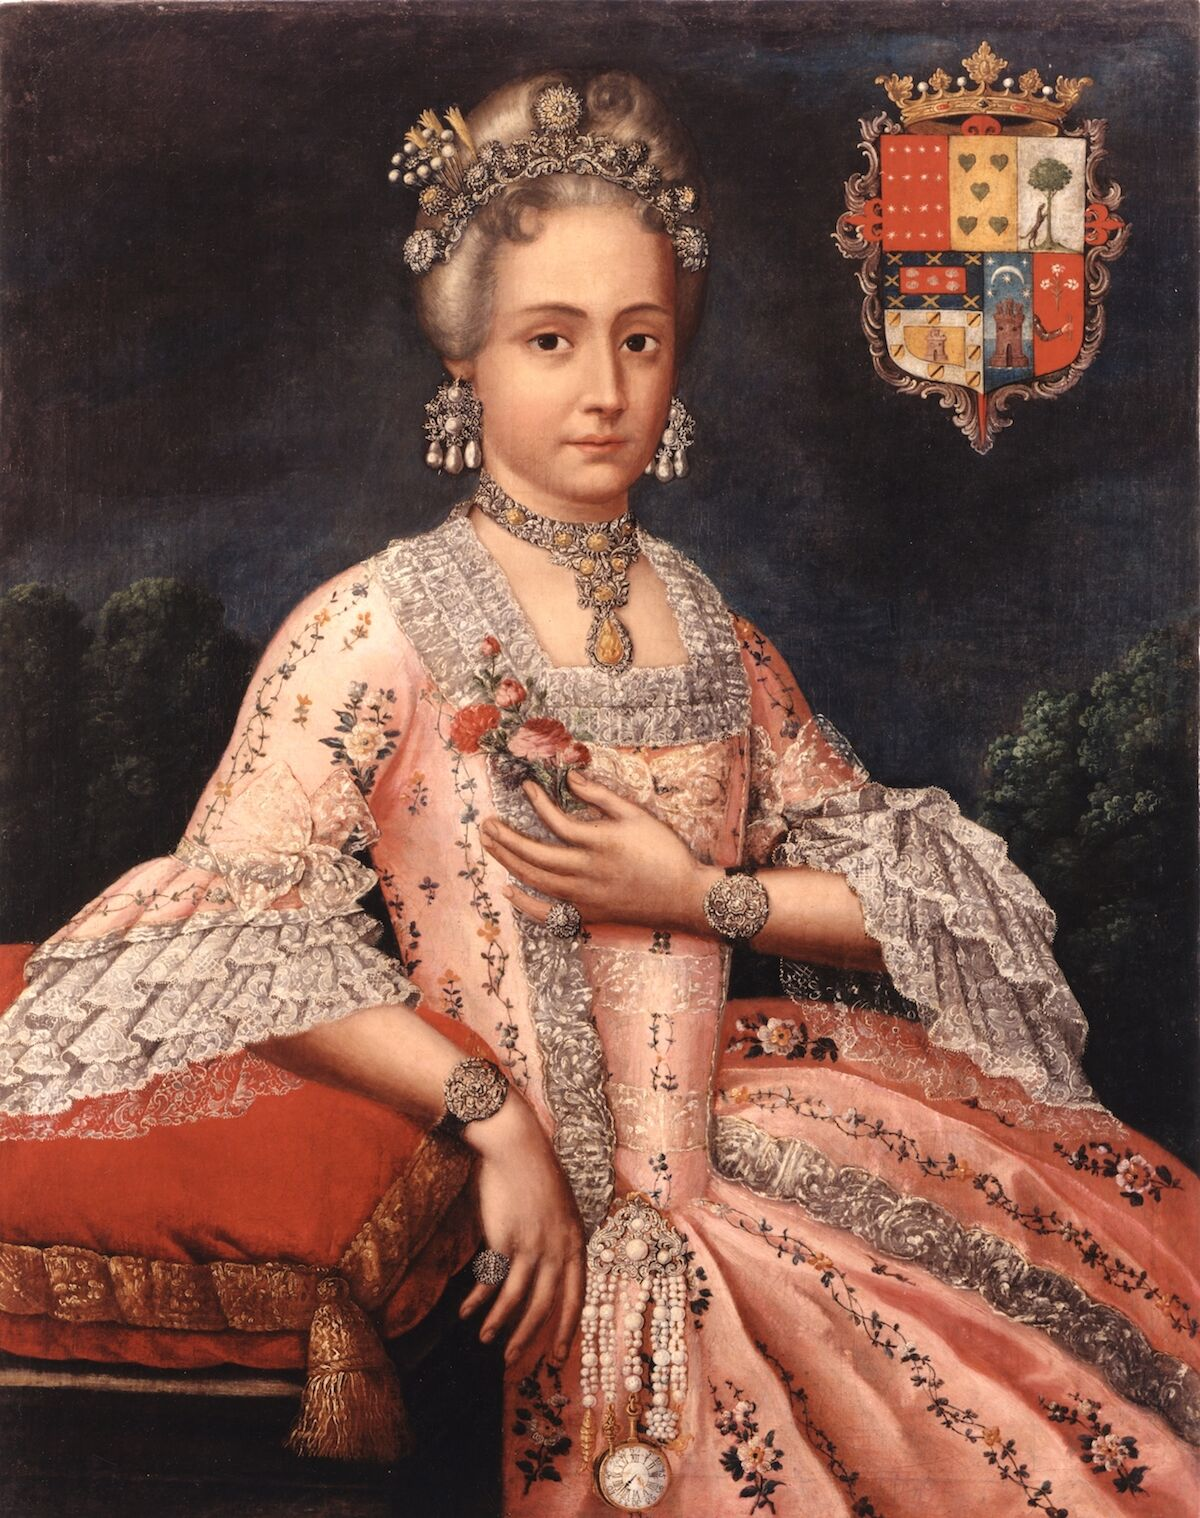 Attributed to Cristóbal Lozano, Rosa de Salazar y Gabiño, Countess of Monteblanco and Montemar Peru, c. 1763, oil on canvas. Courtesy the Blanton Museum of Art, The University of Texas at Austin.